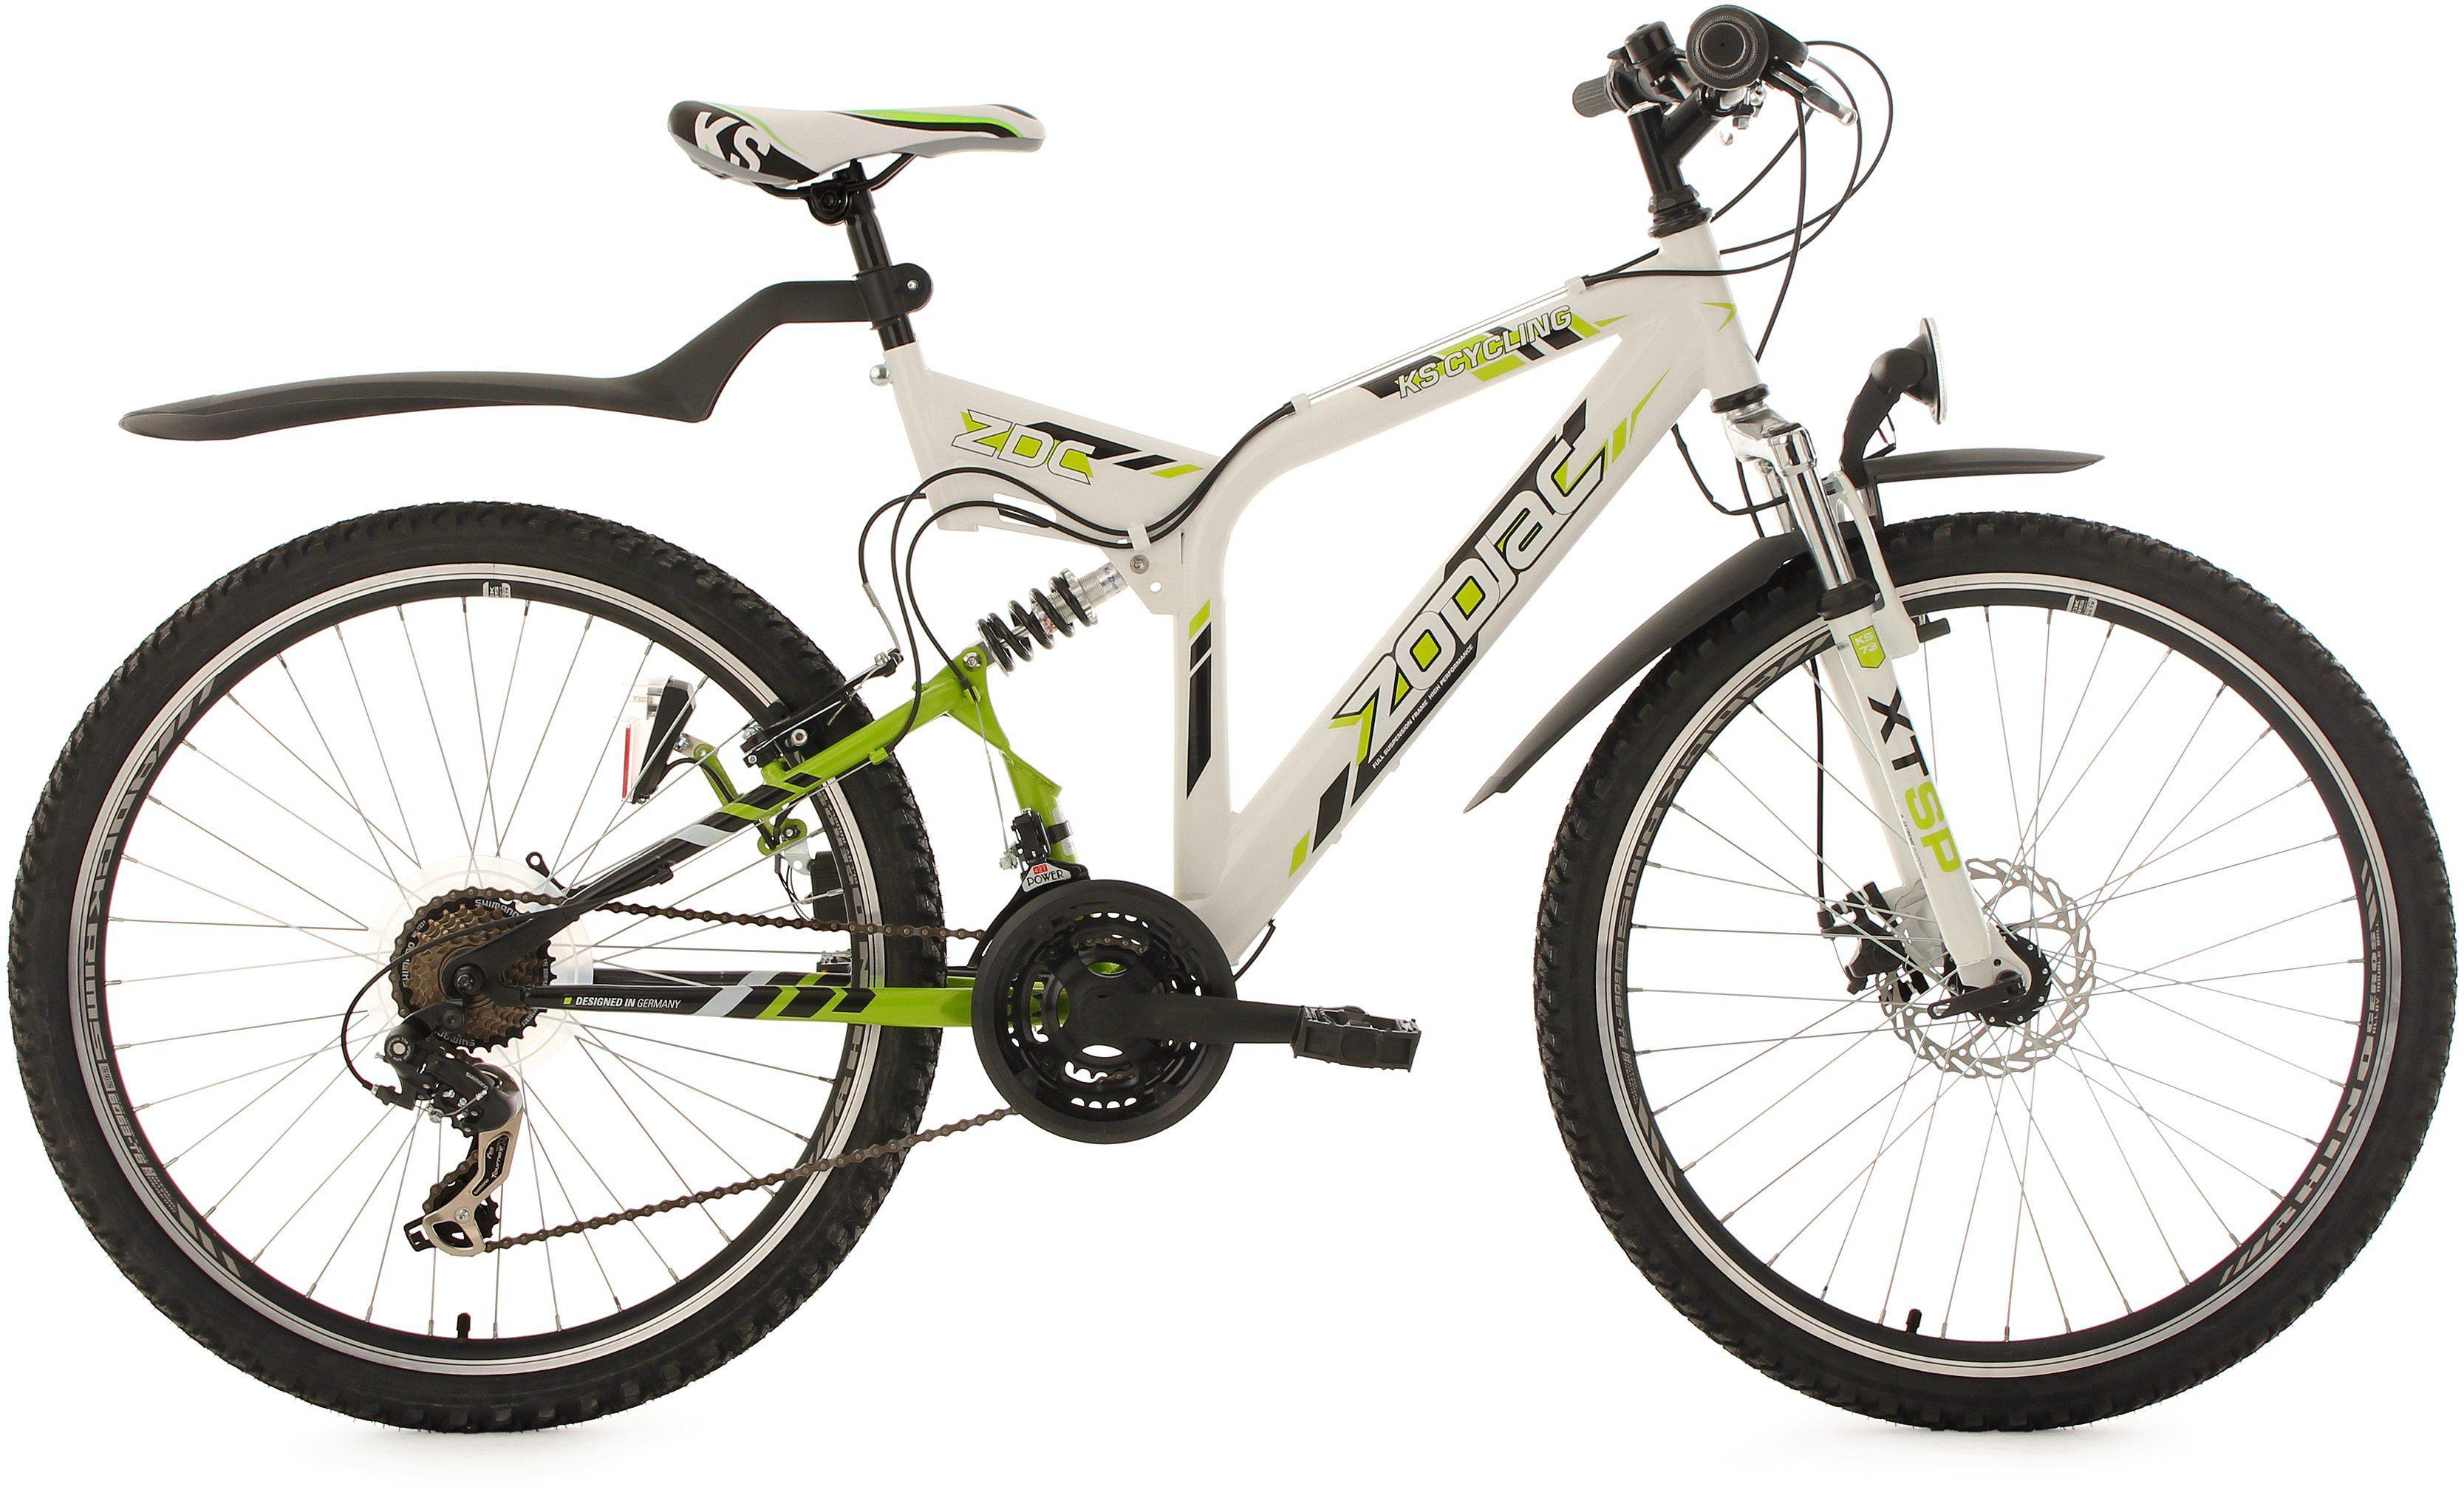 KS Cycling Fully-Mountainbike, 26 Zoll, 21 Gang-Shimano Tourney Kettenschaltung, weiß-grün, »Zodiac«